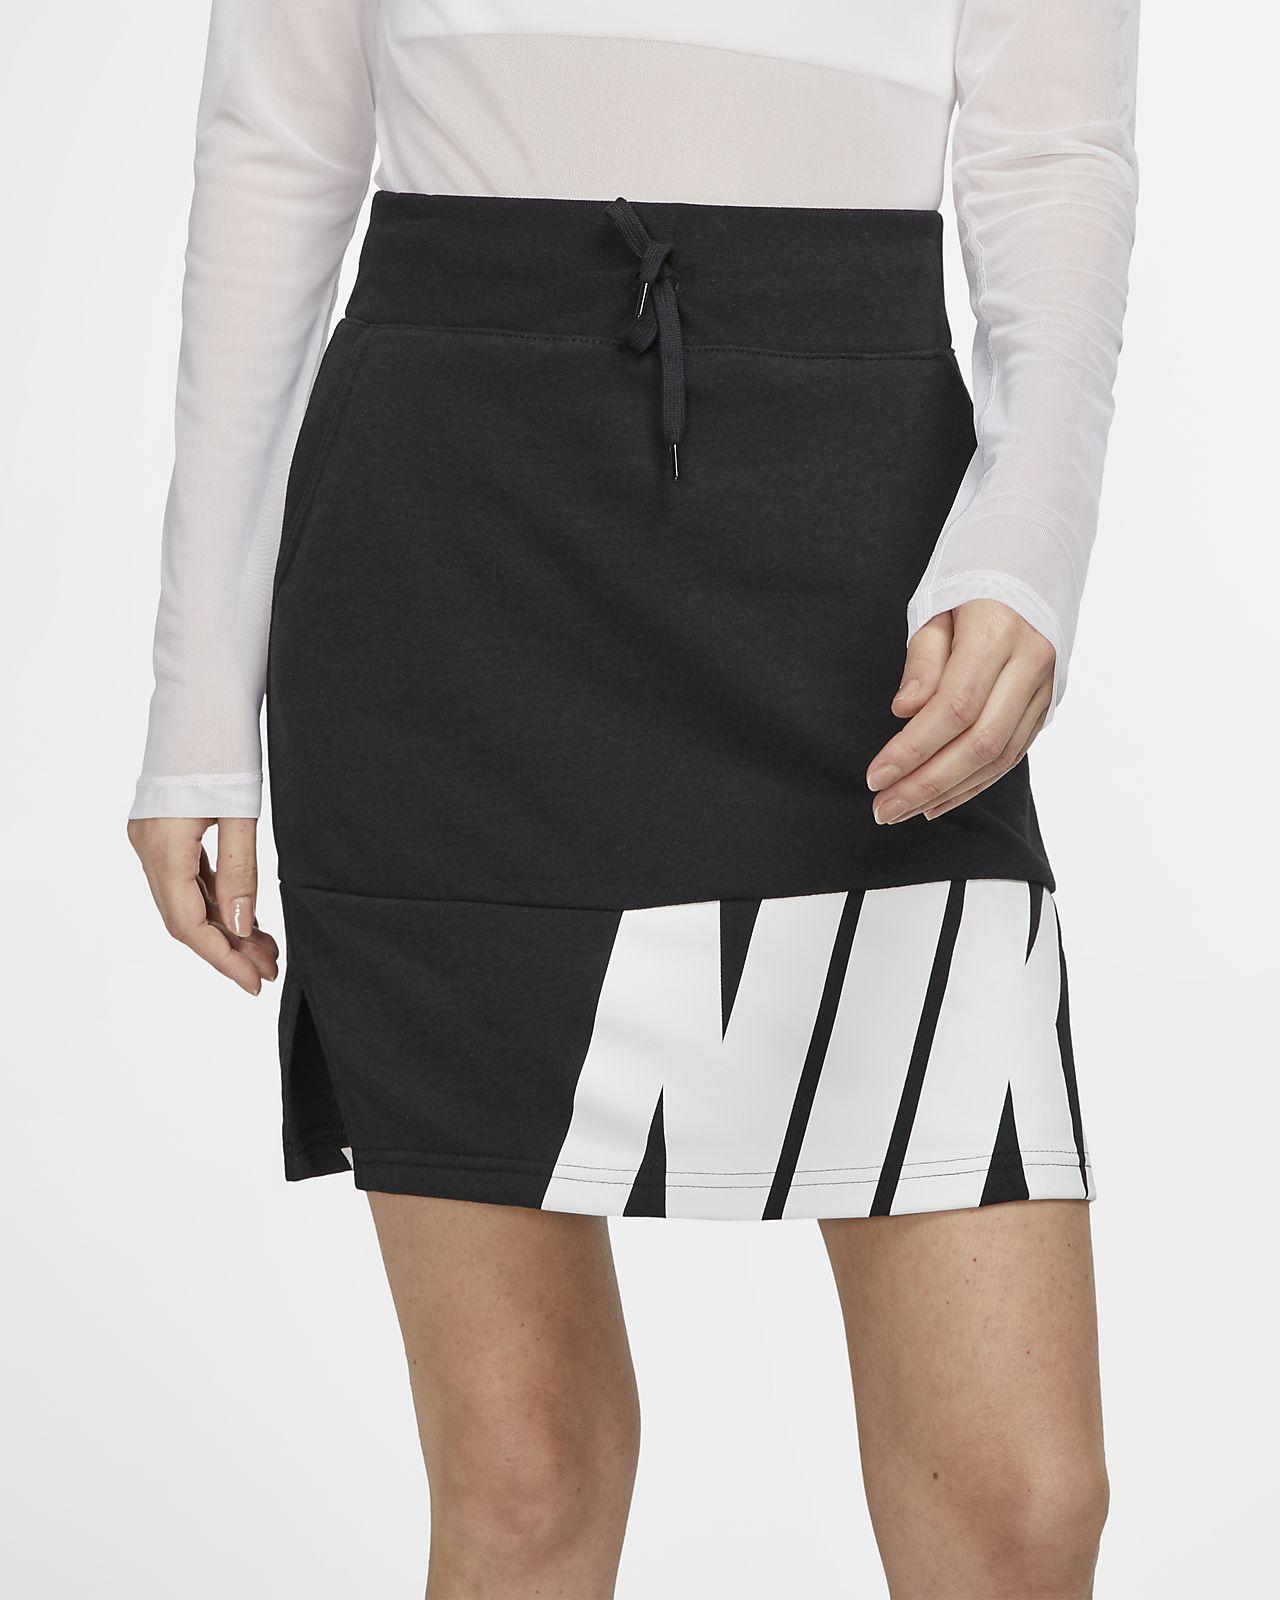 Falda de tejido Fleece para niña talla grande Nike Sportswear